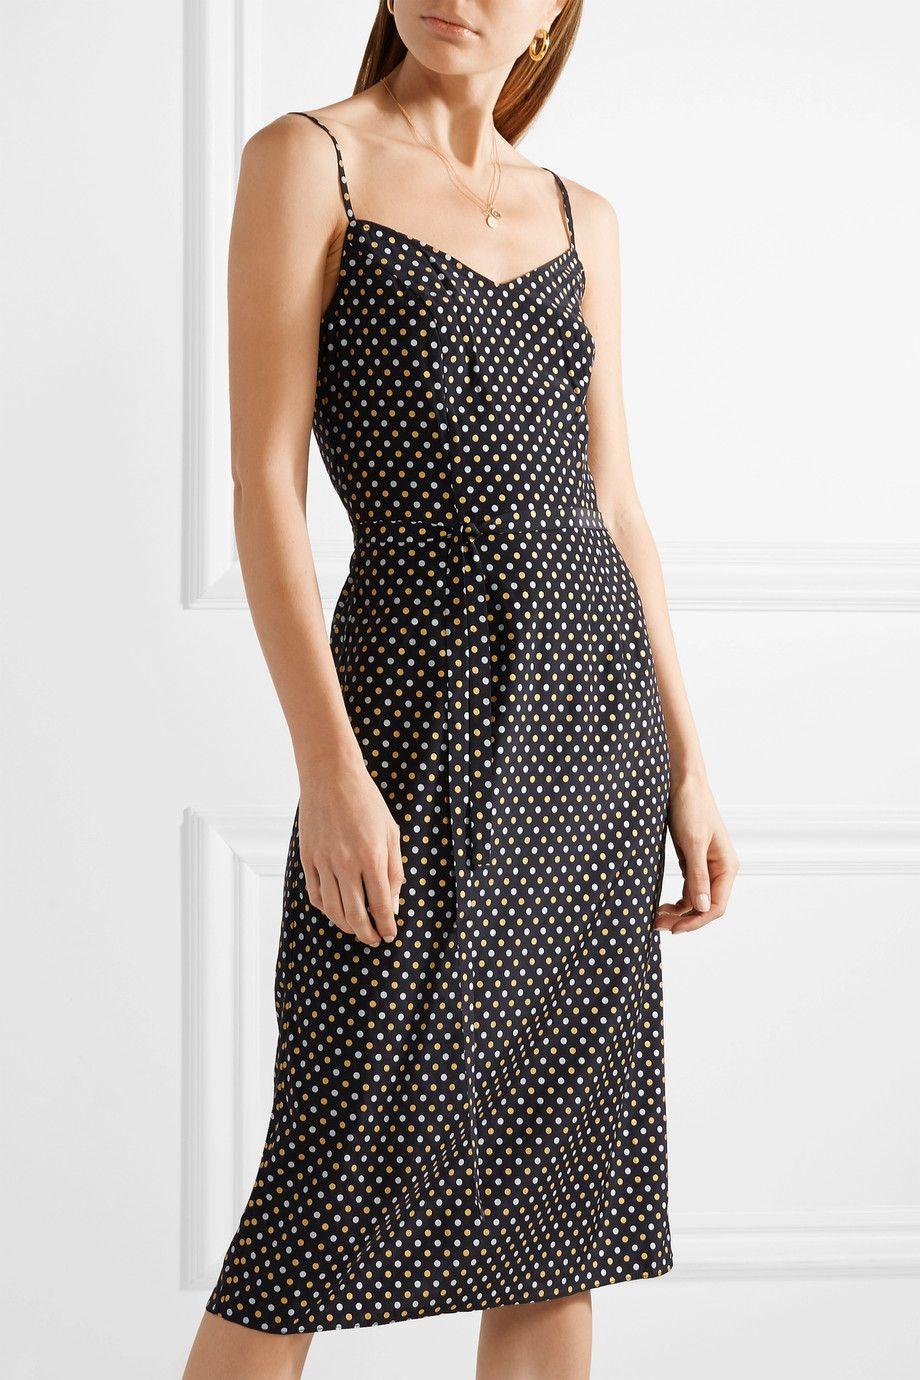 Lily Metallic Polka-dot Silk Crepe De Chine Dress - Black HVN jfhB3NVgaP